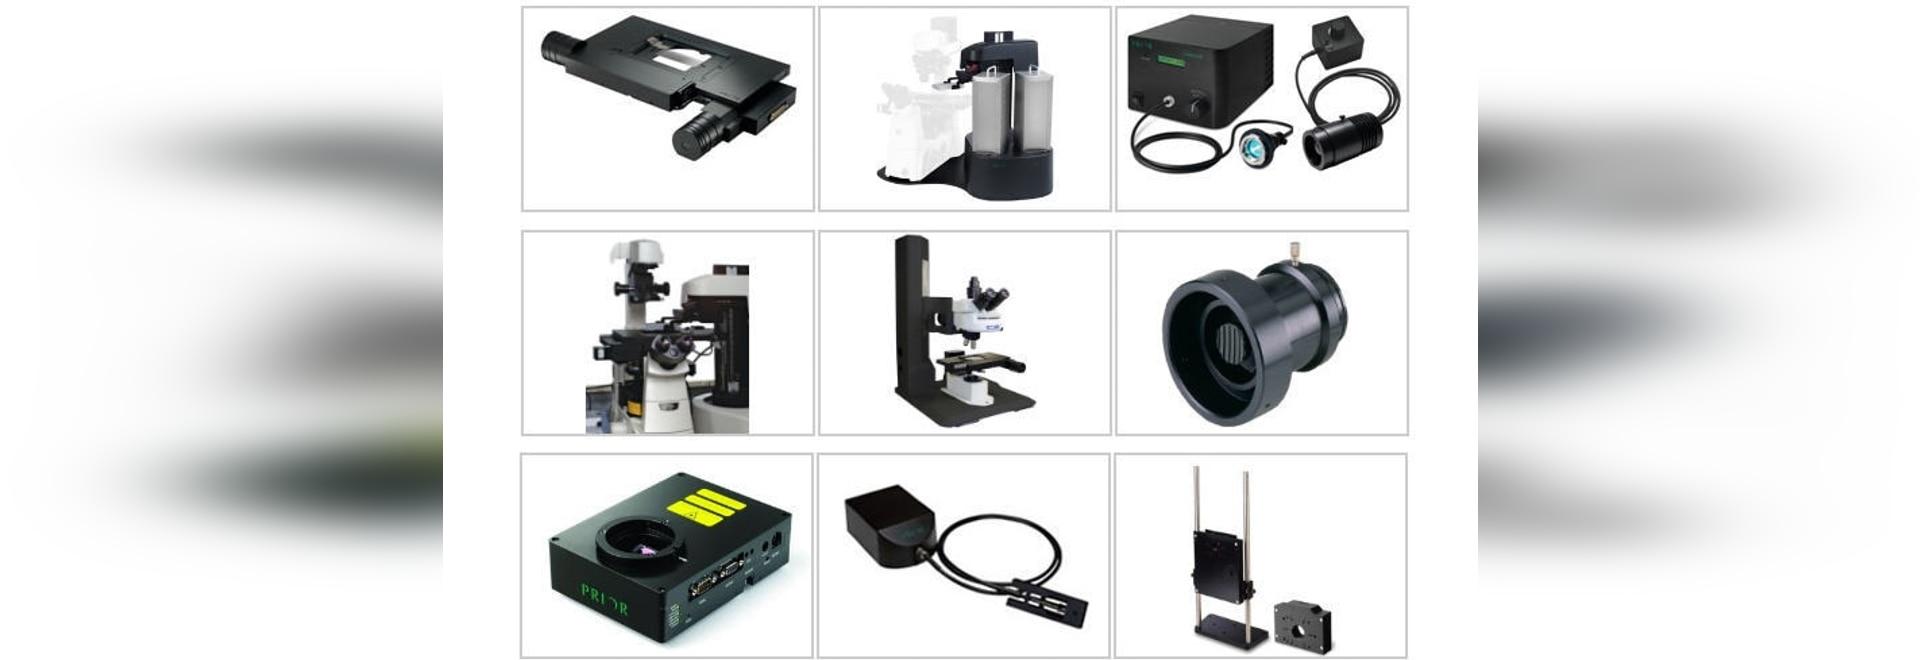 Prior Scientific announces exhibits at two Major Microscopy shows